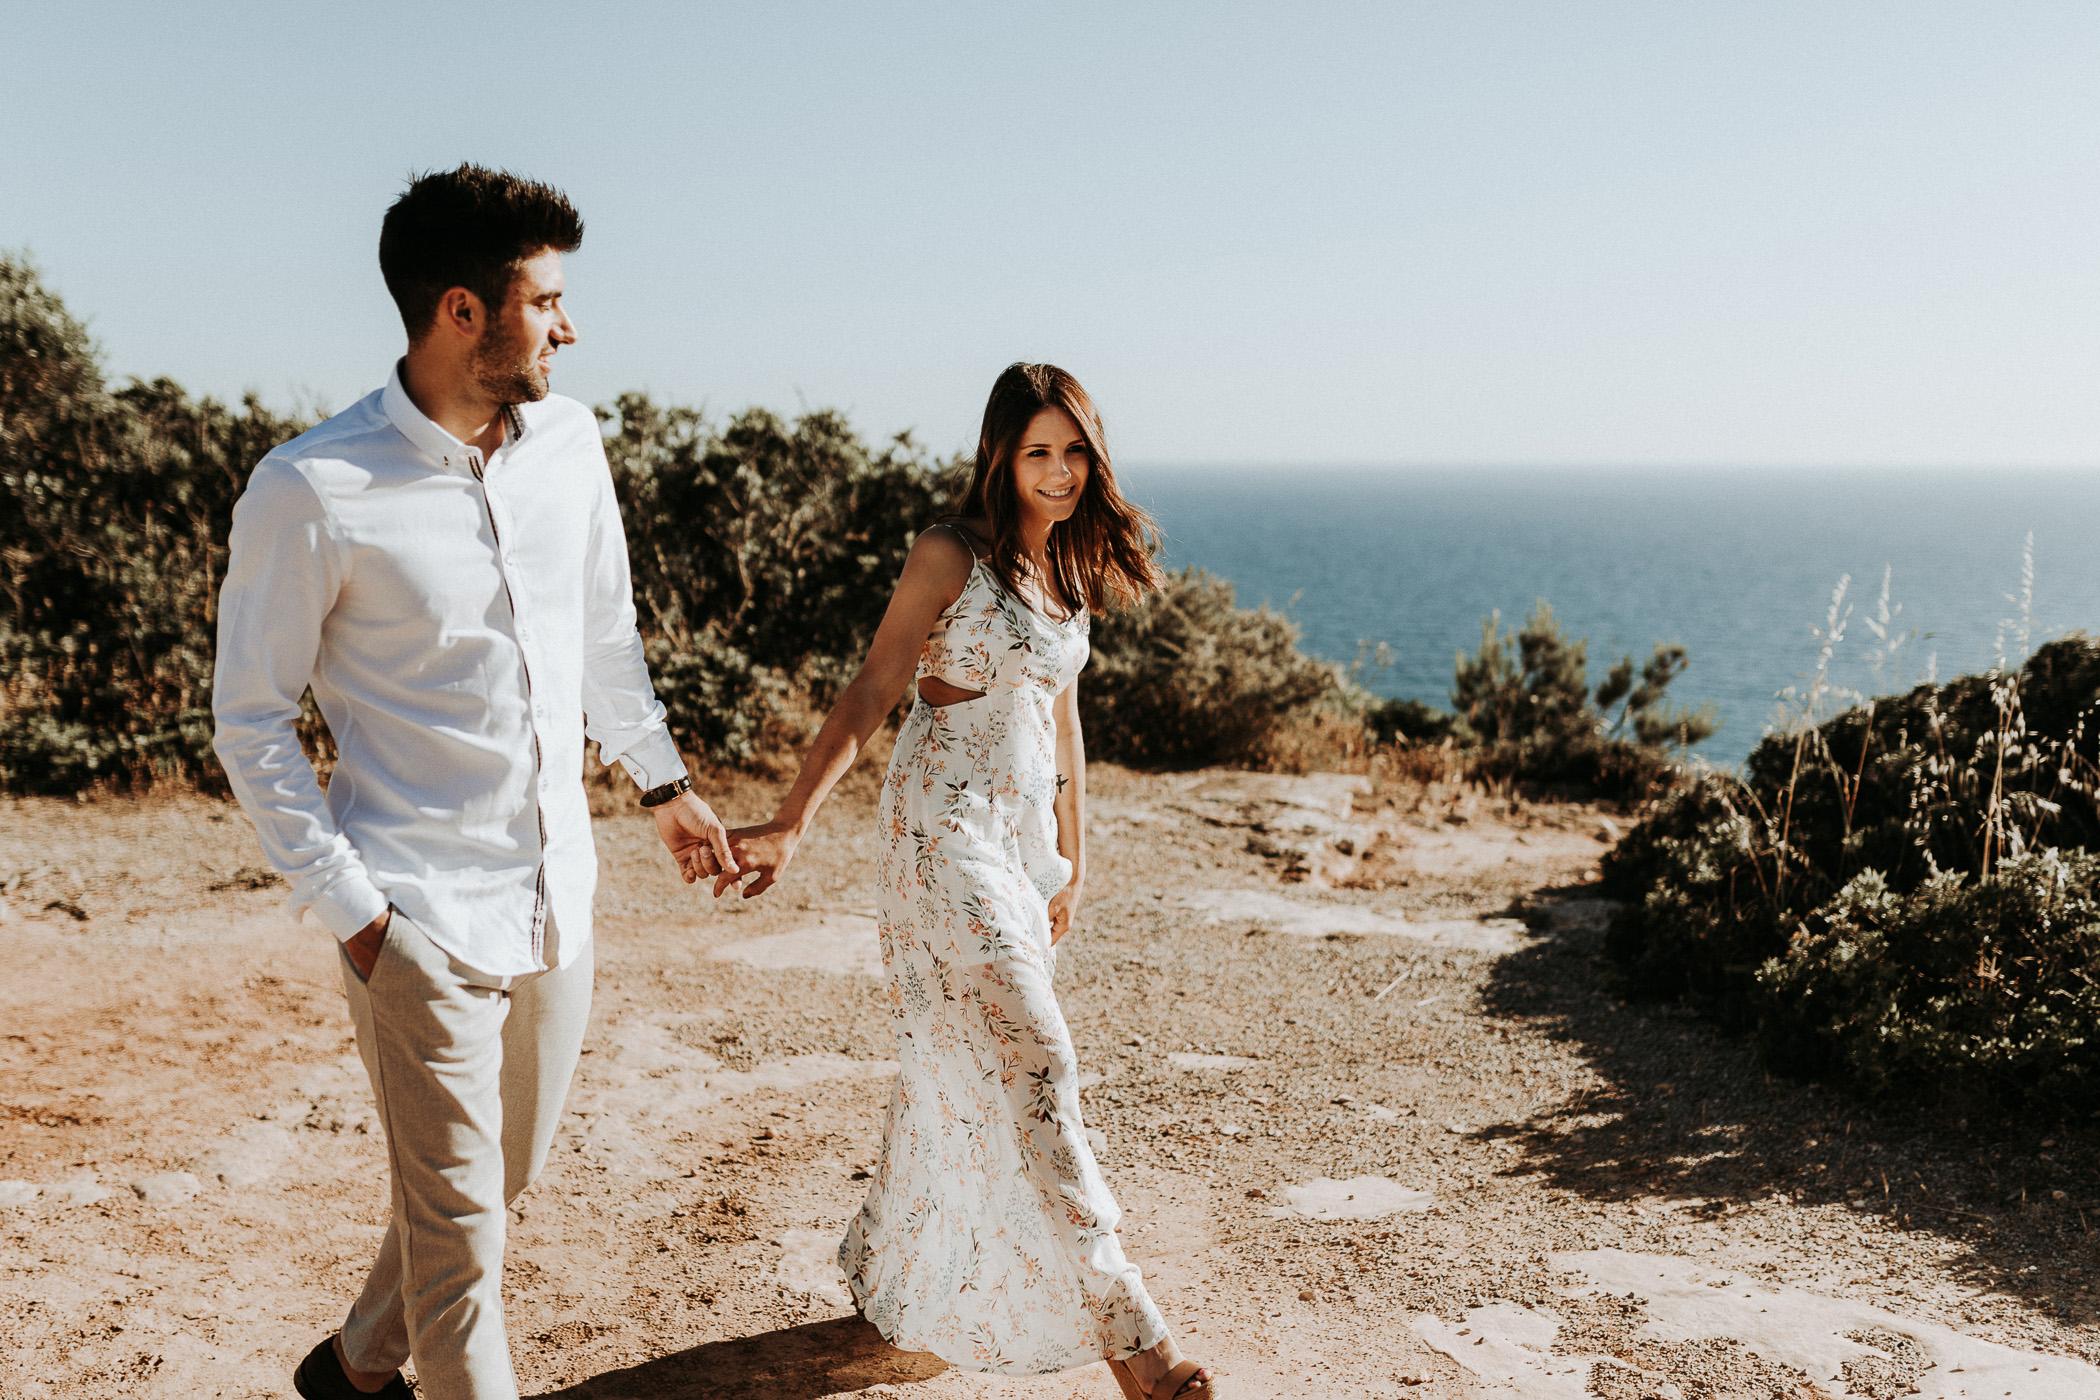 DanielaMarquardtPhotography_wedding_elopement_mallorca_spain_calapi_palma_lauraandtoni_41